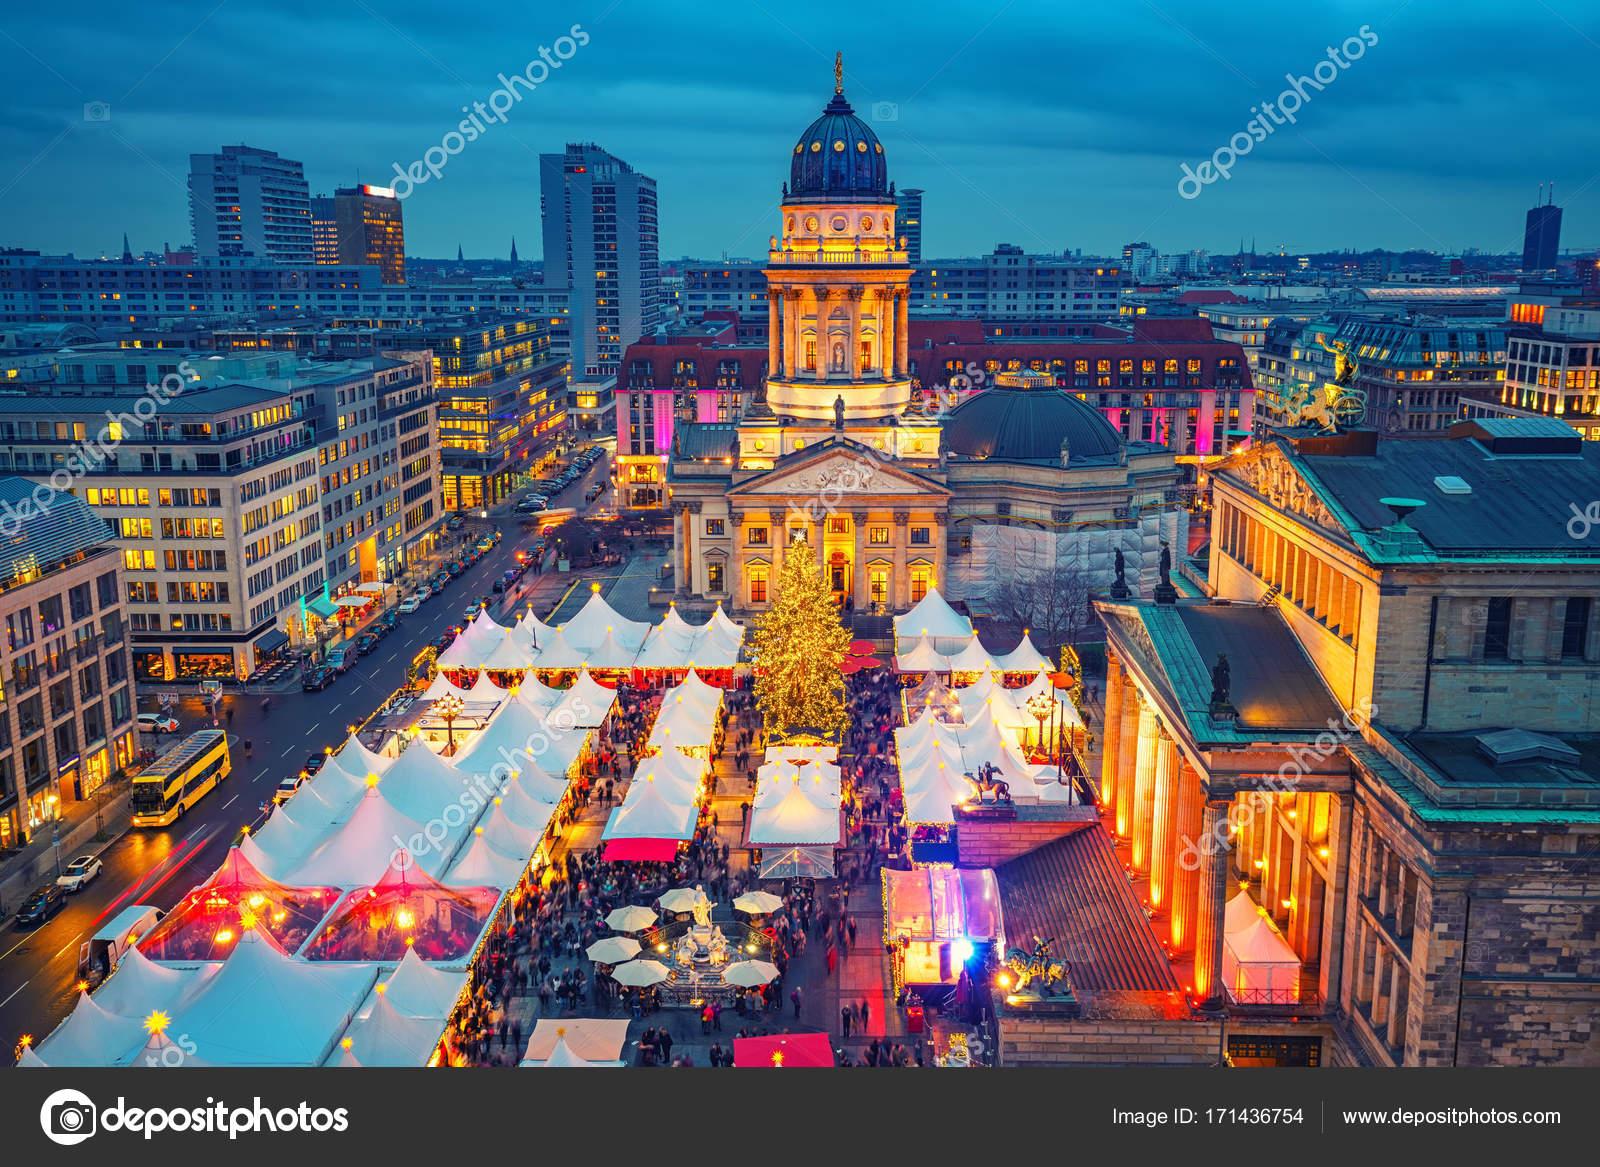 weihnachtsmarkt in berlin stockfoto sborisov 171436754. Black Bedroom Furniture Sets. Home Design Ideas